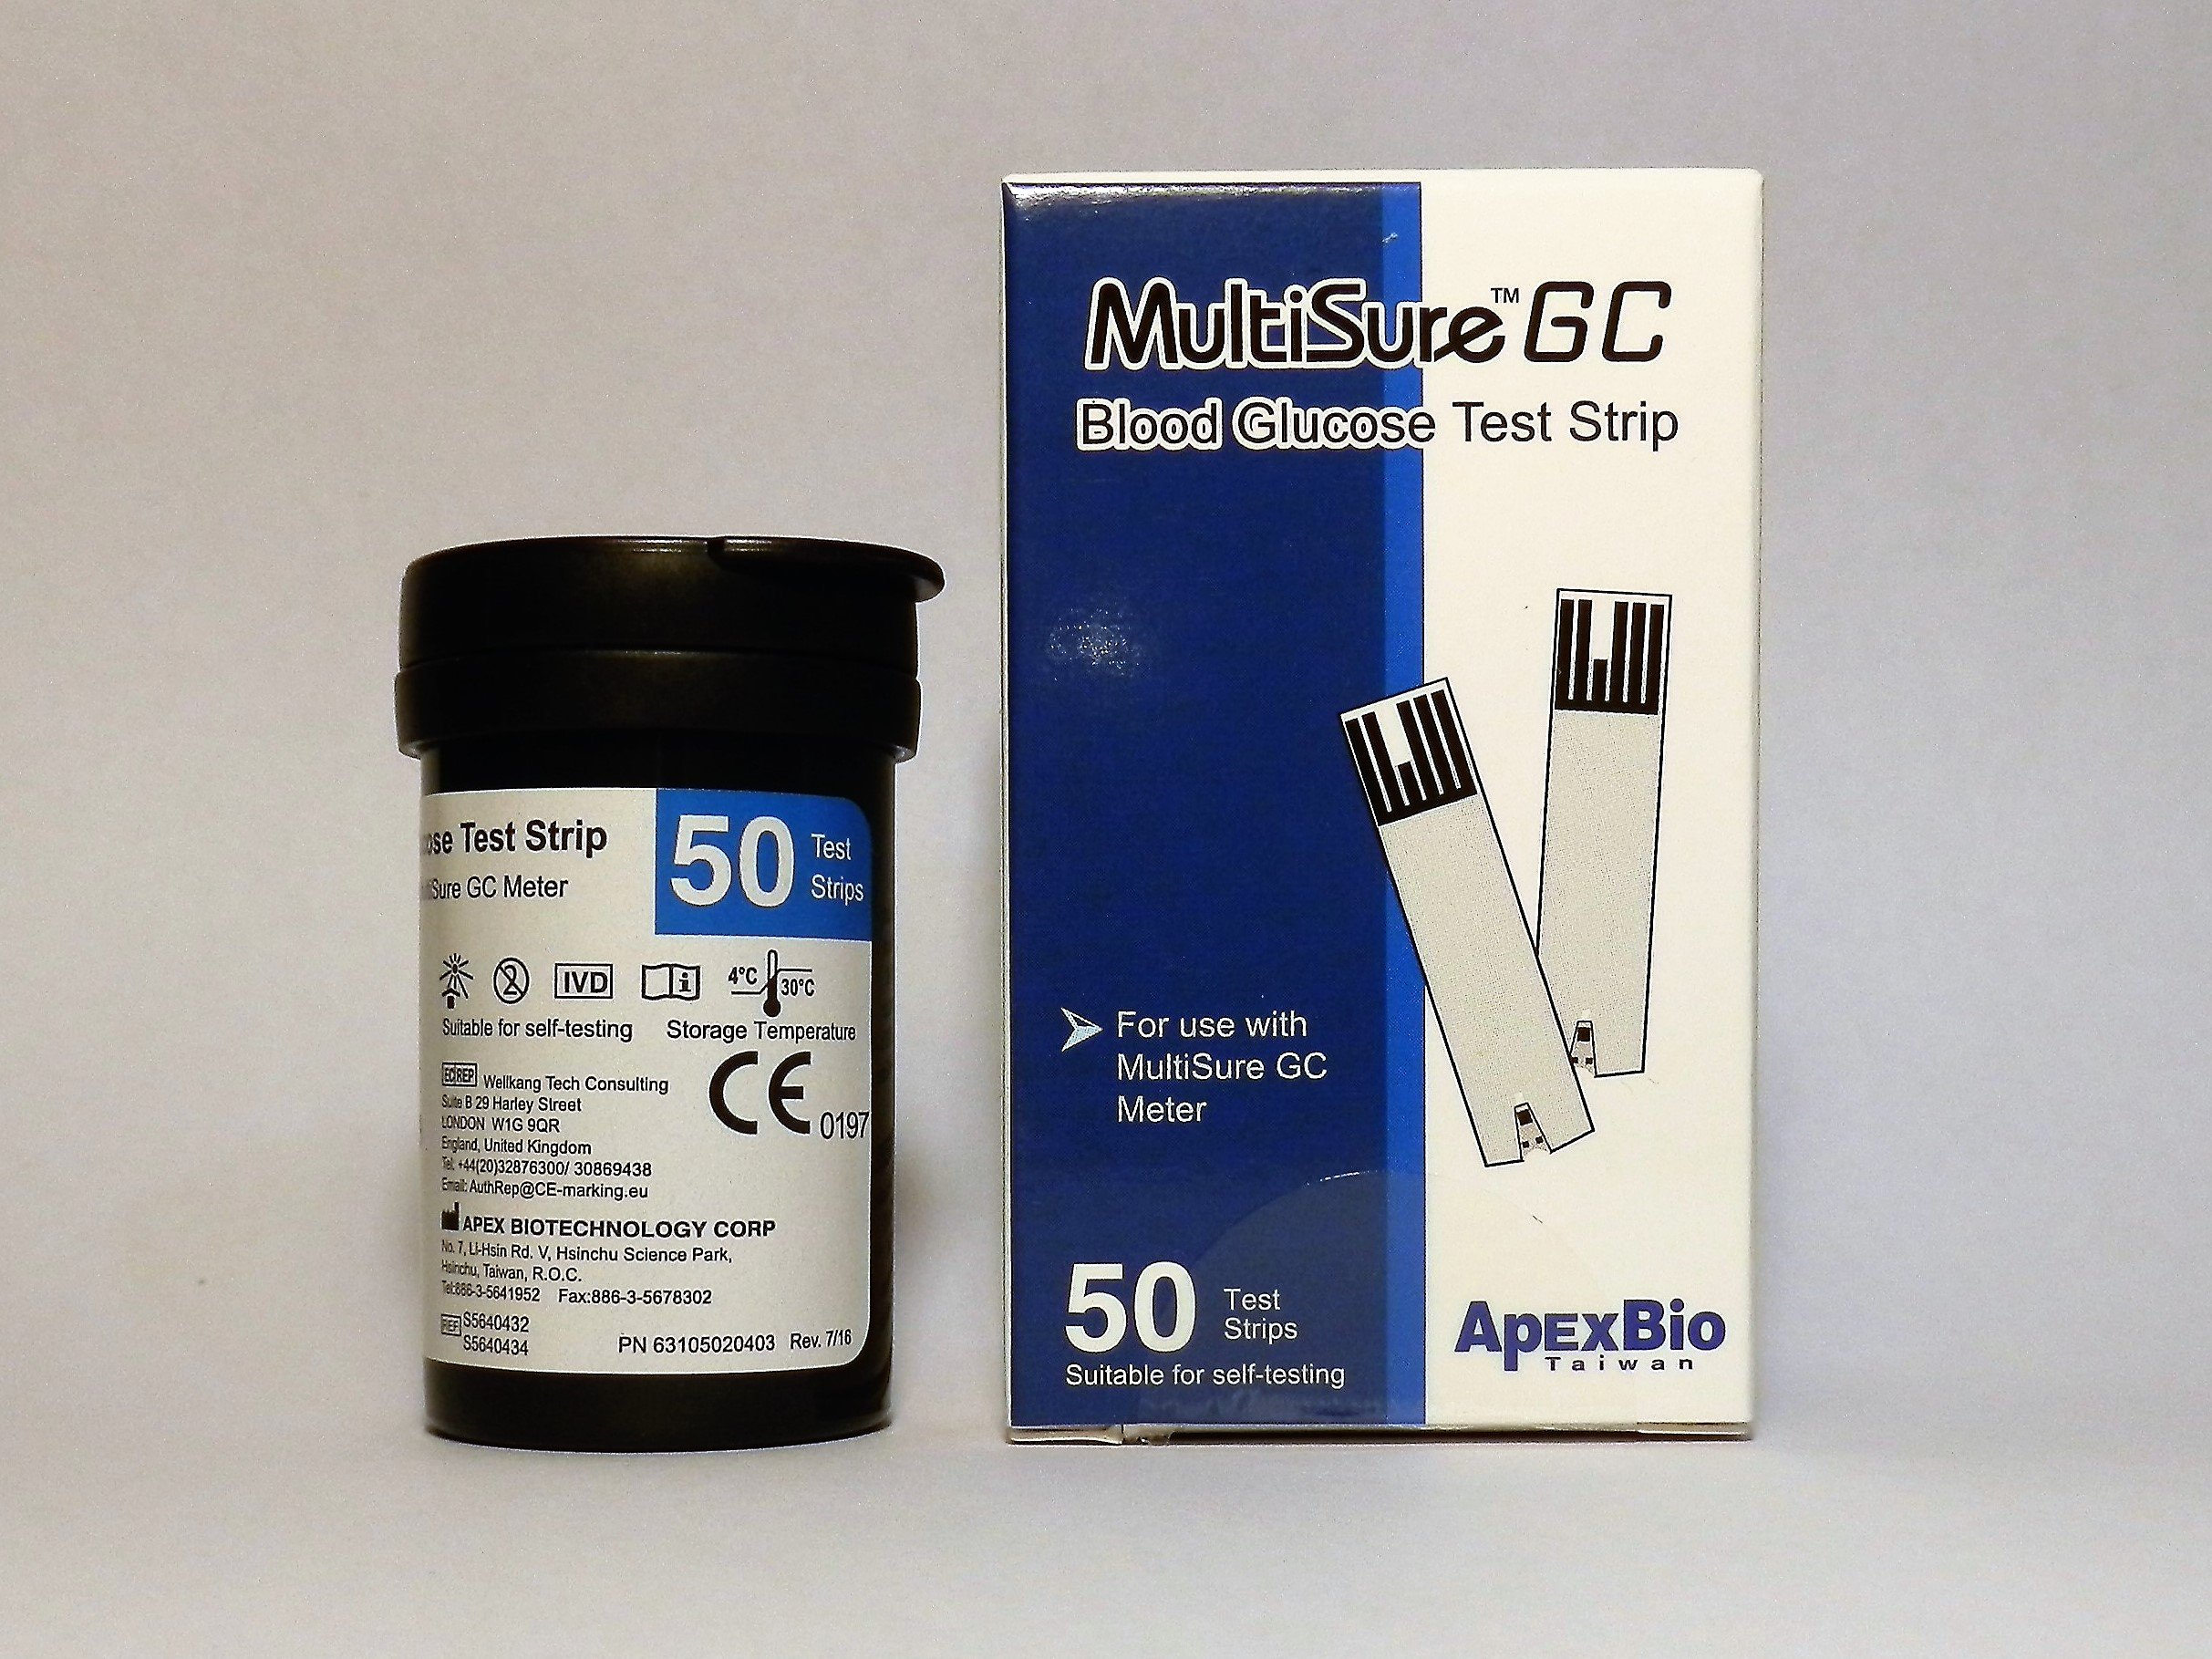 MultiSure GC Blood Glucose Test Strips (50pcs)